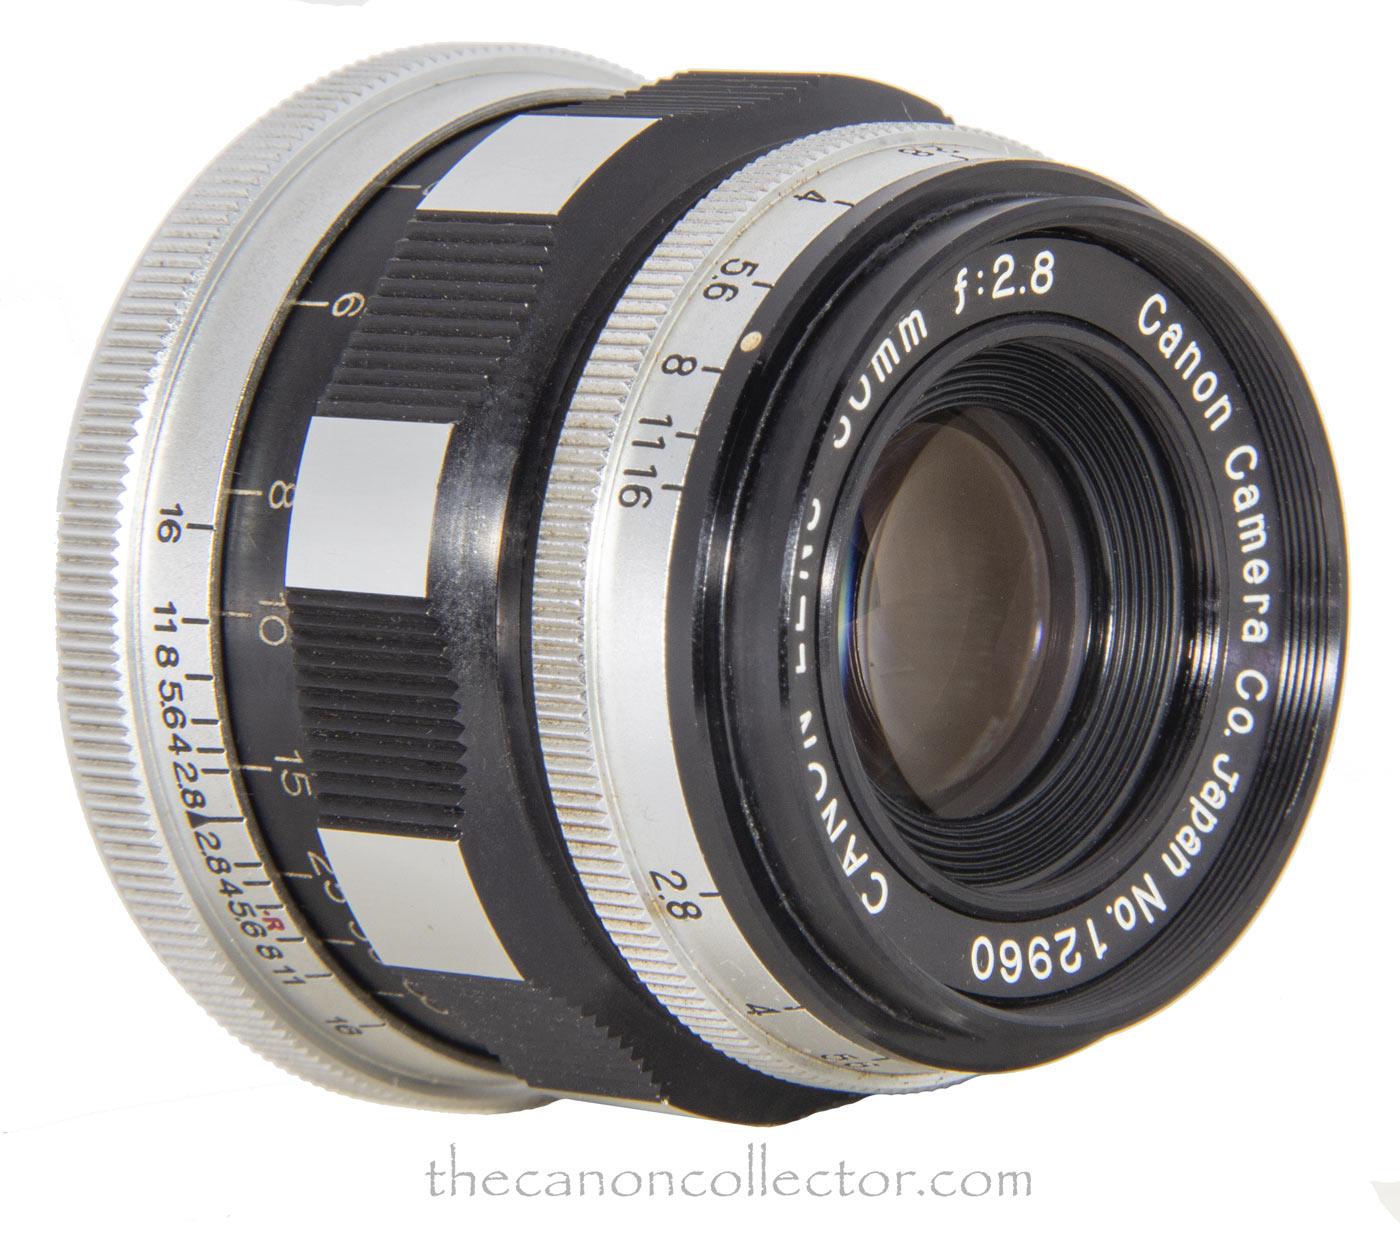 Canon Lens 50mm f/2.8 (I)